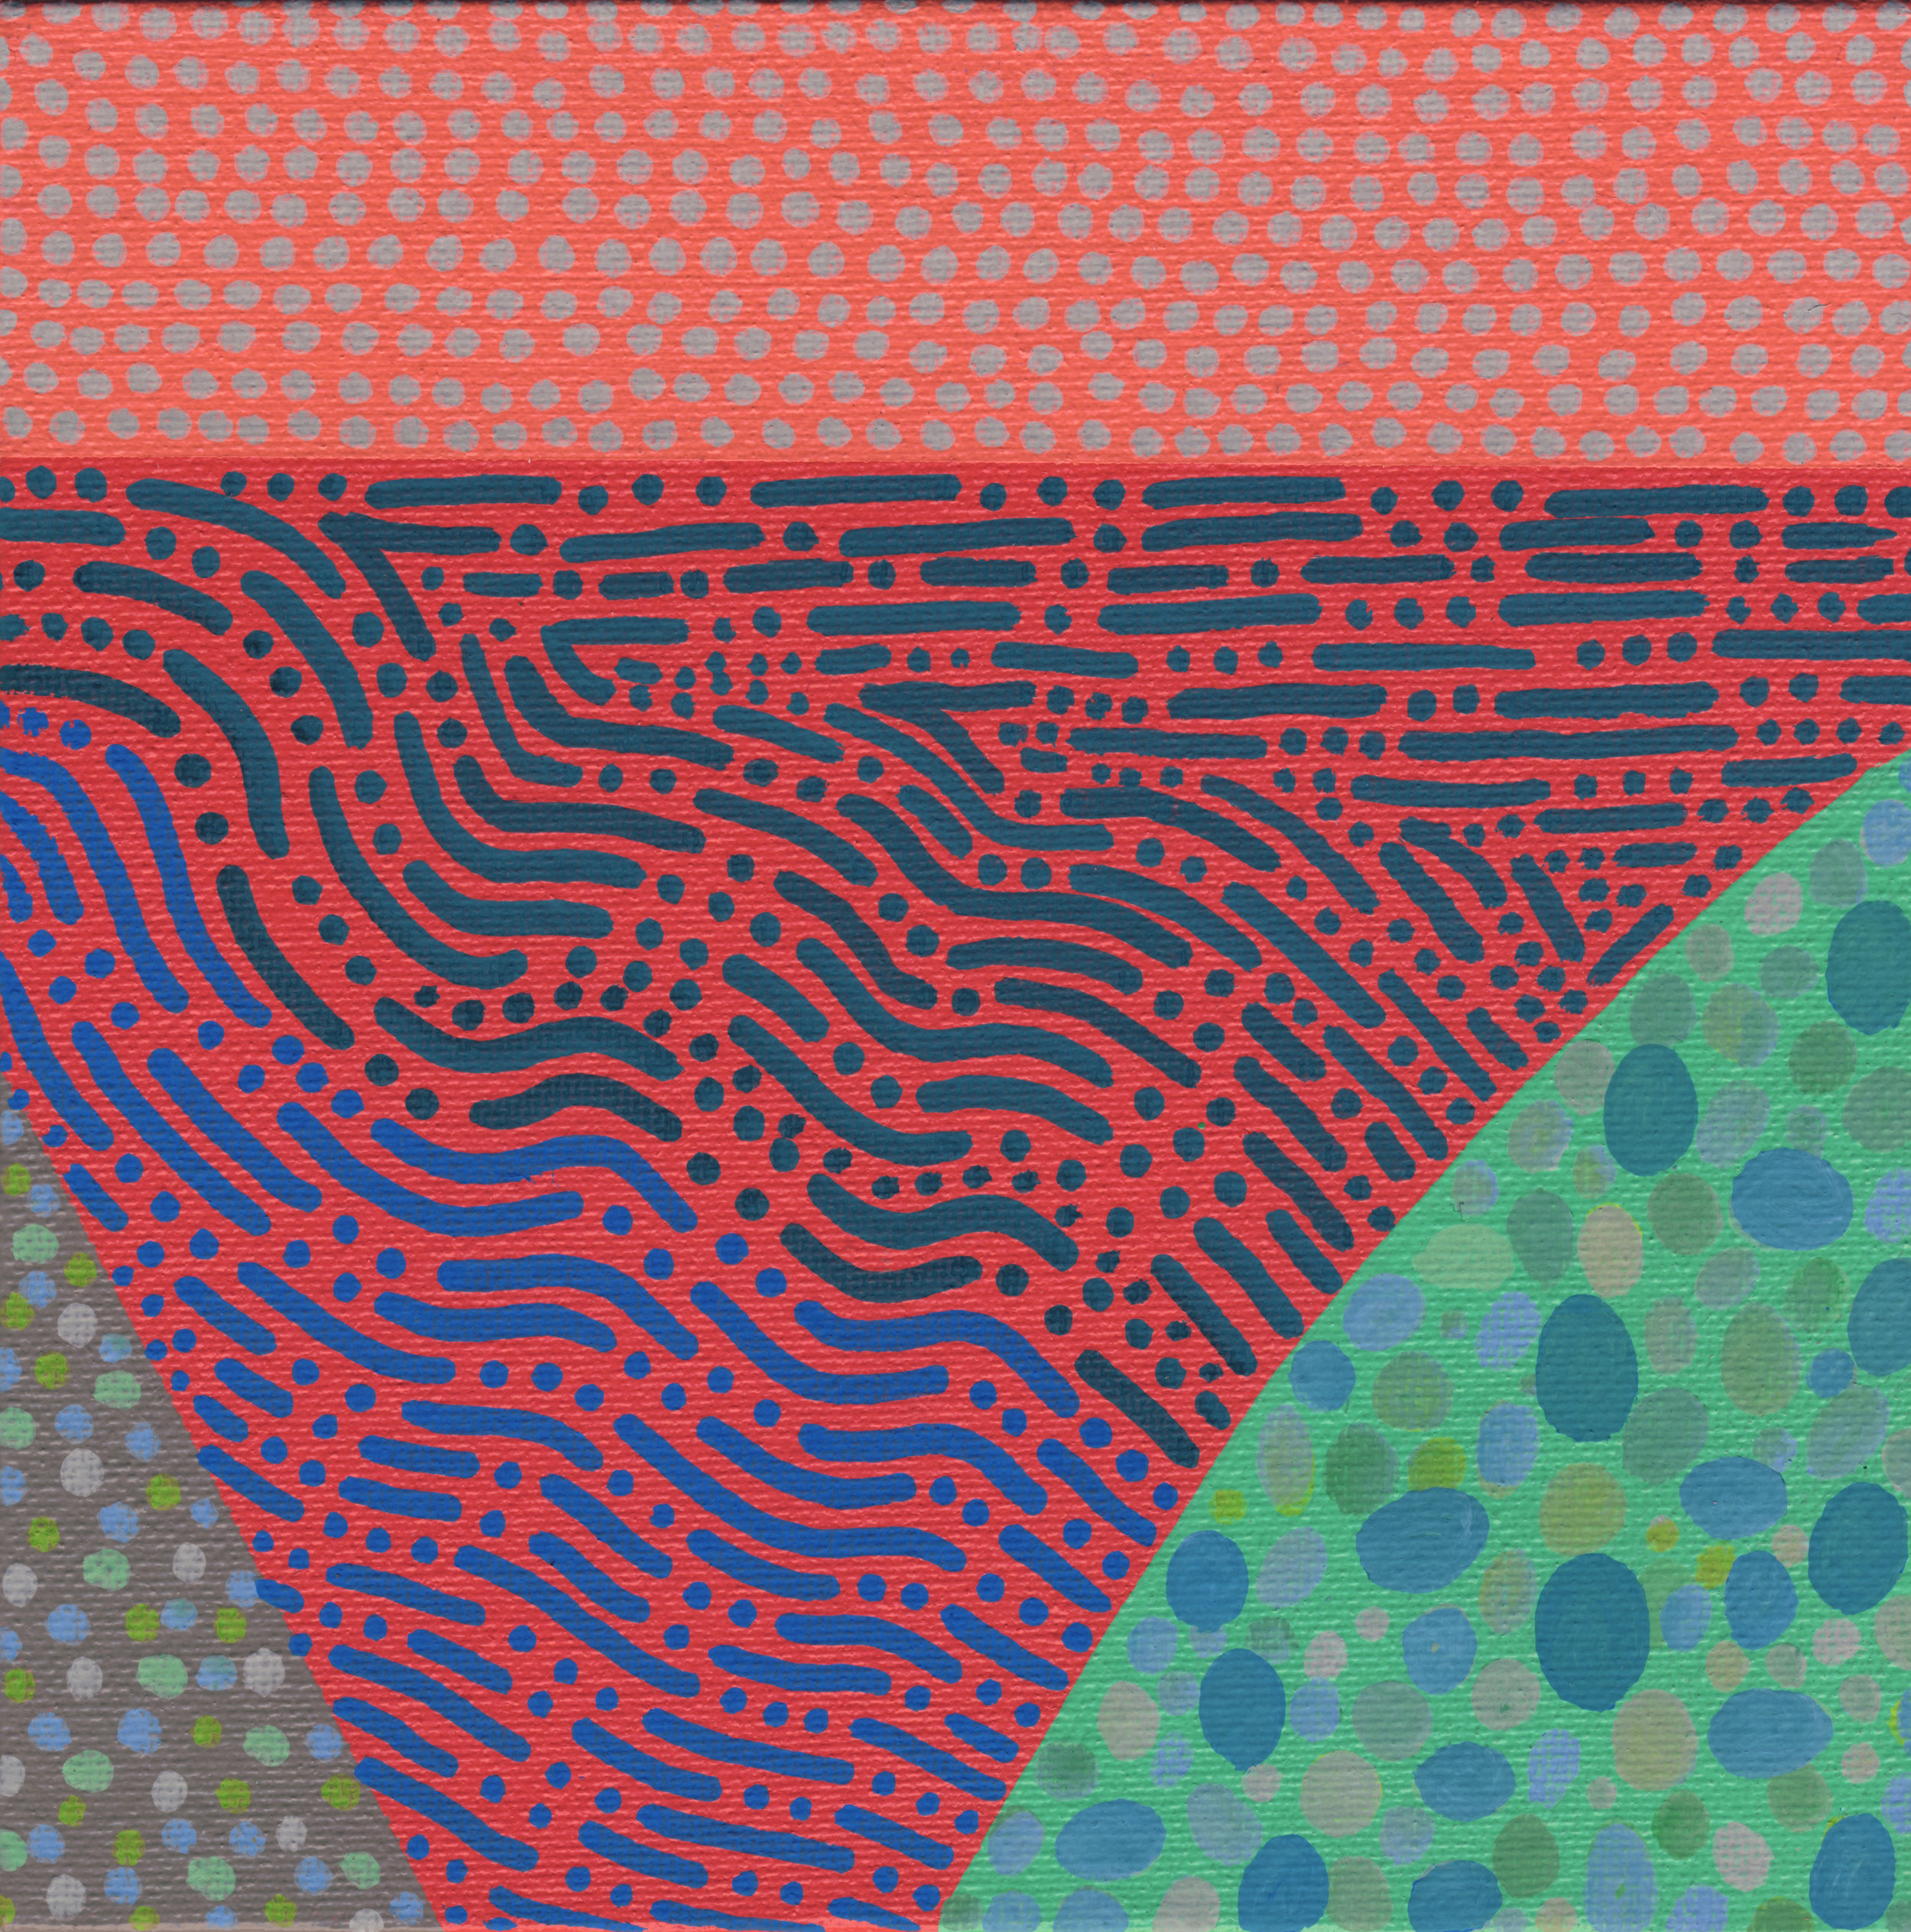 "84/100, Acrylic on canvas panel, 6"" X 6"", 3/31/19"